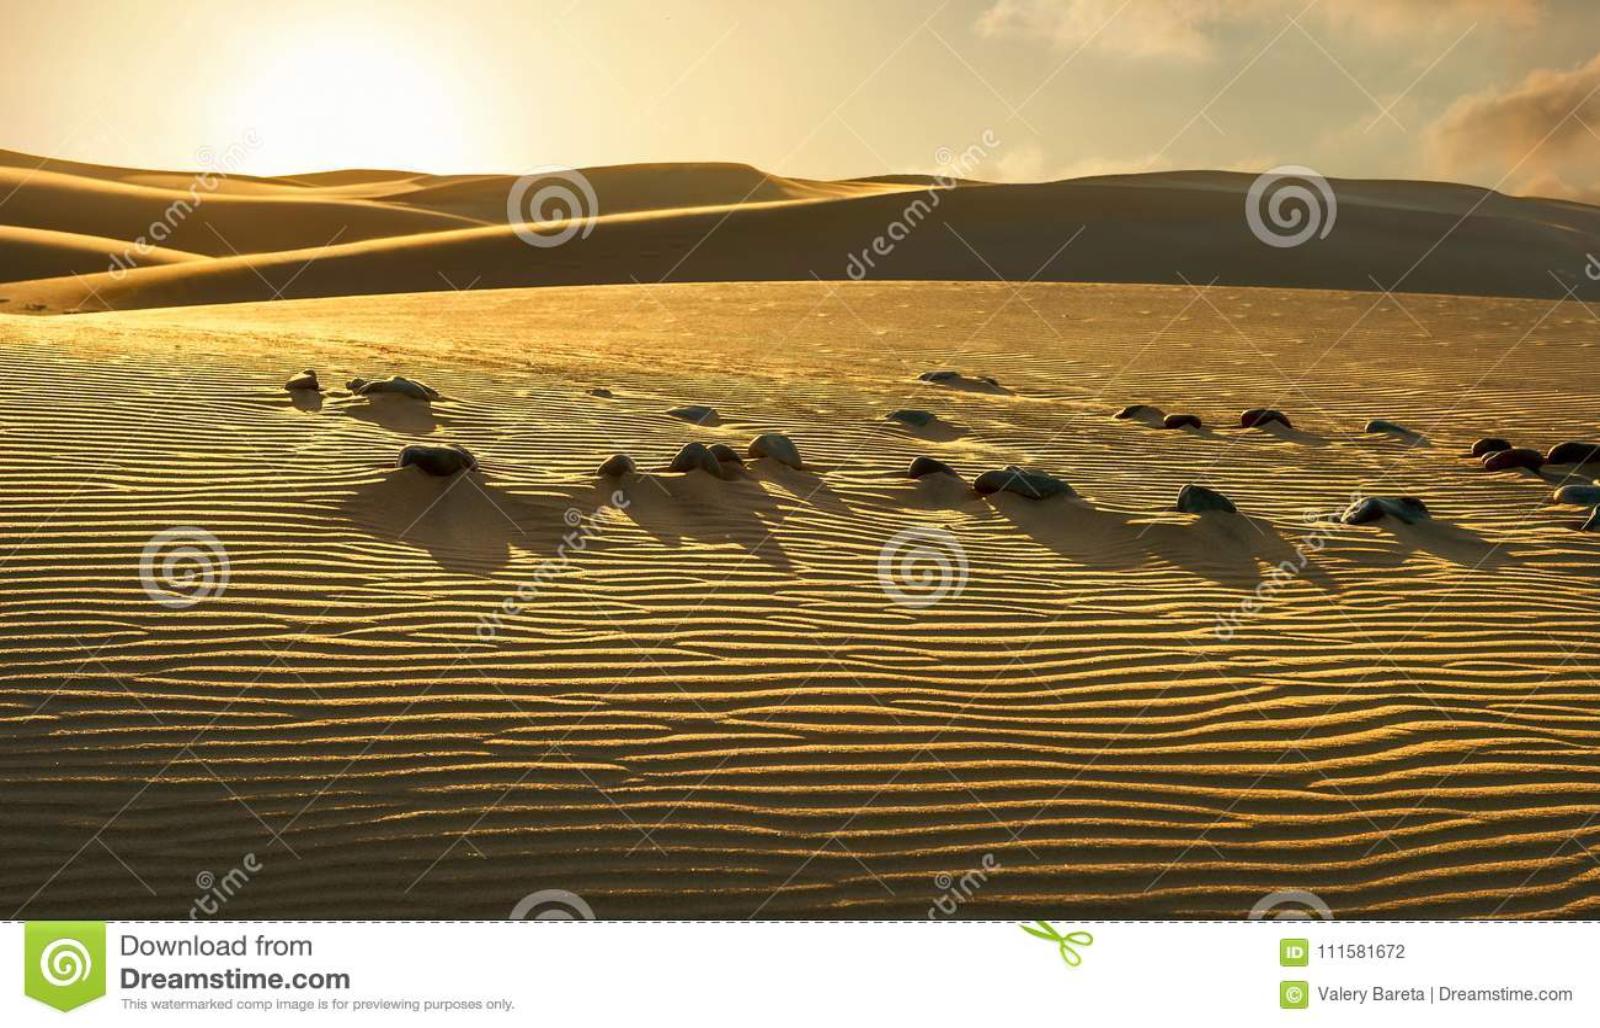 Nationaal park van Maspalomas-zandduinen Gran Canaria, Kanarie isl